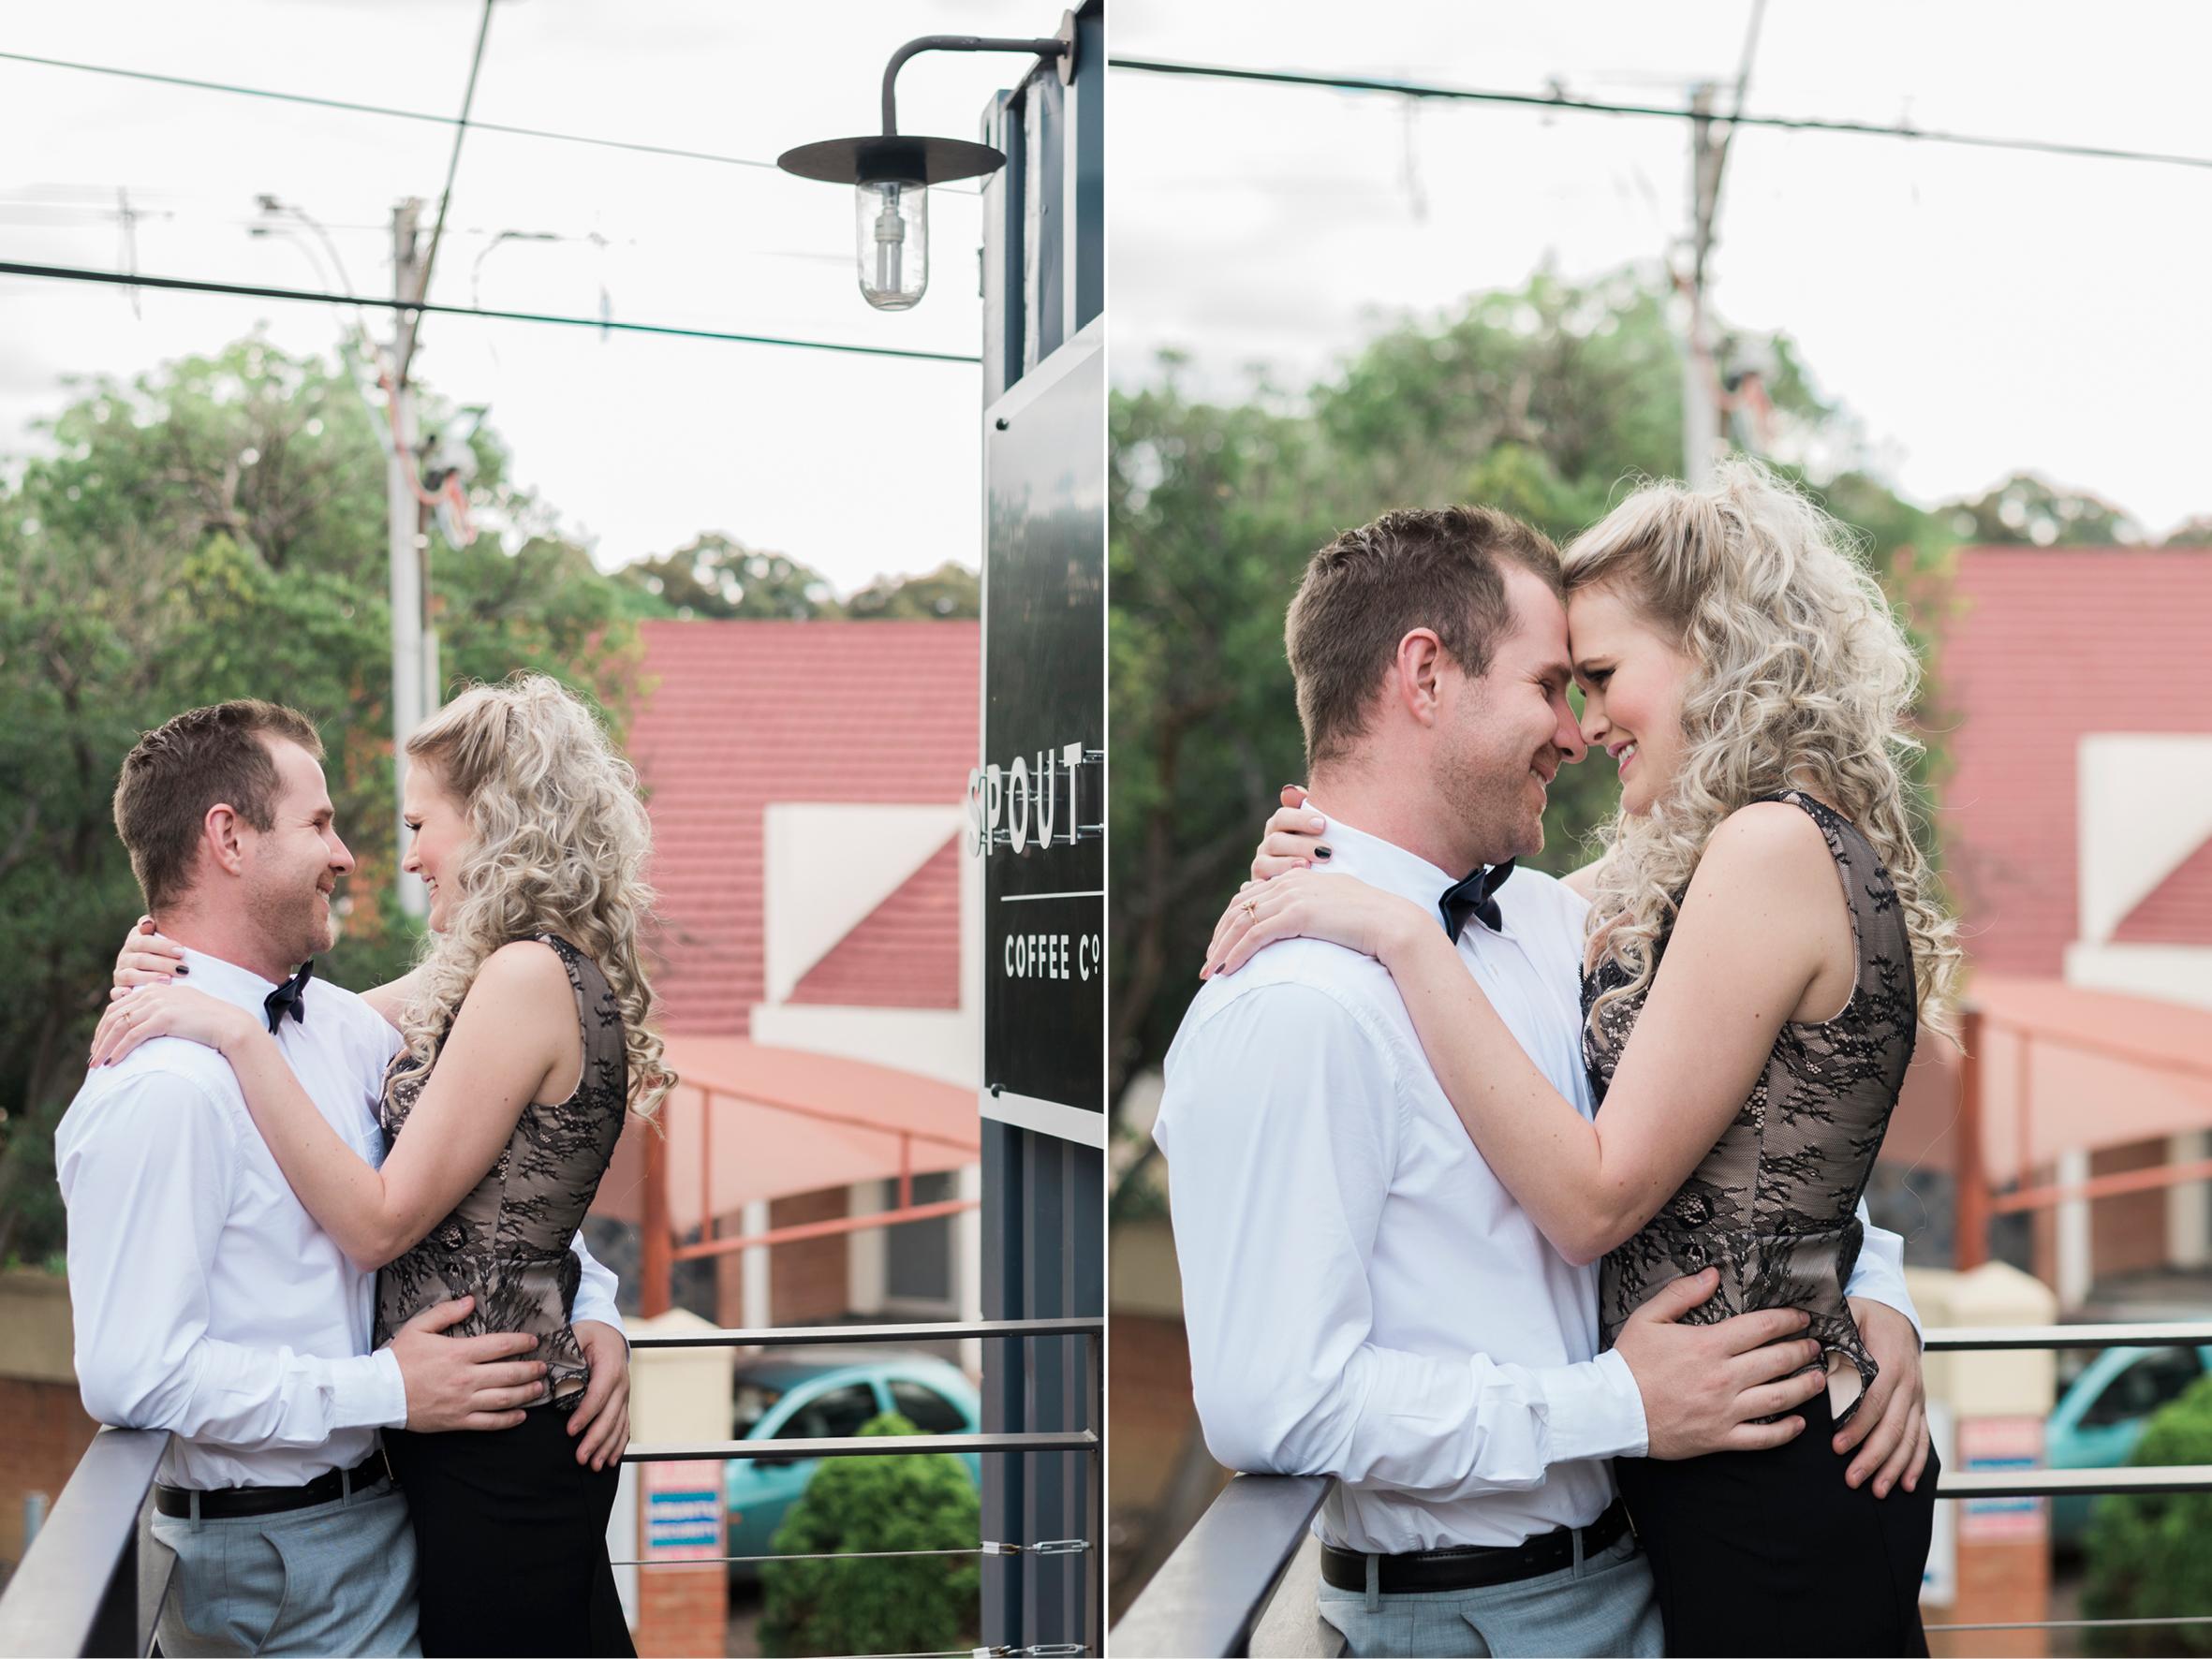 Engagement_Bianca+Hendrik_Jacaranda_city_Bronwyn_Alyson_19.jpg